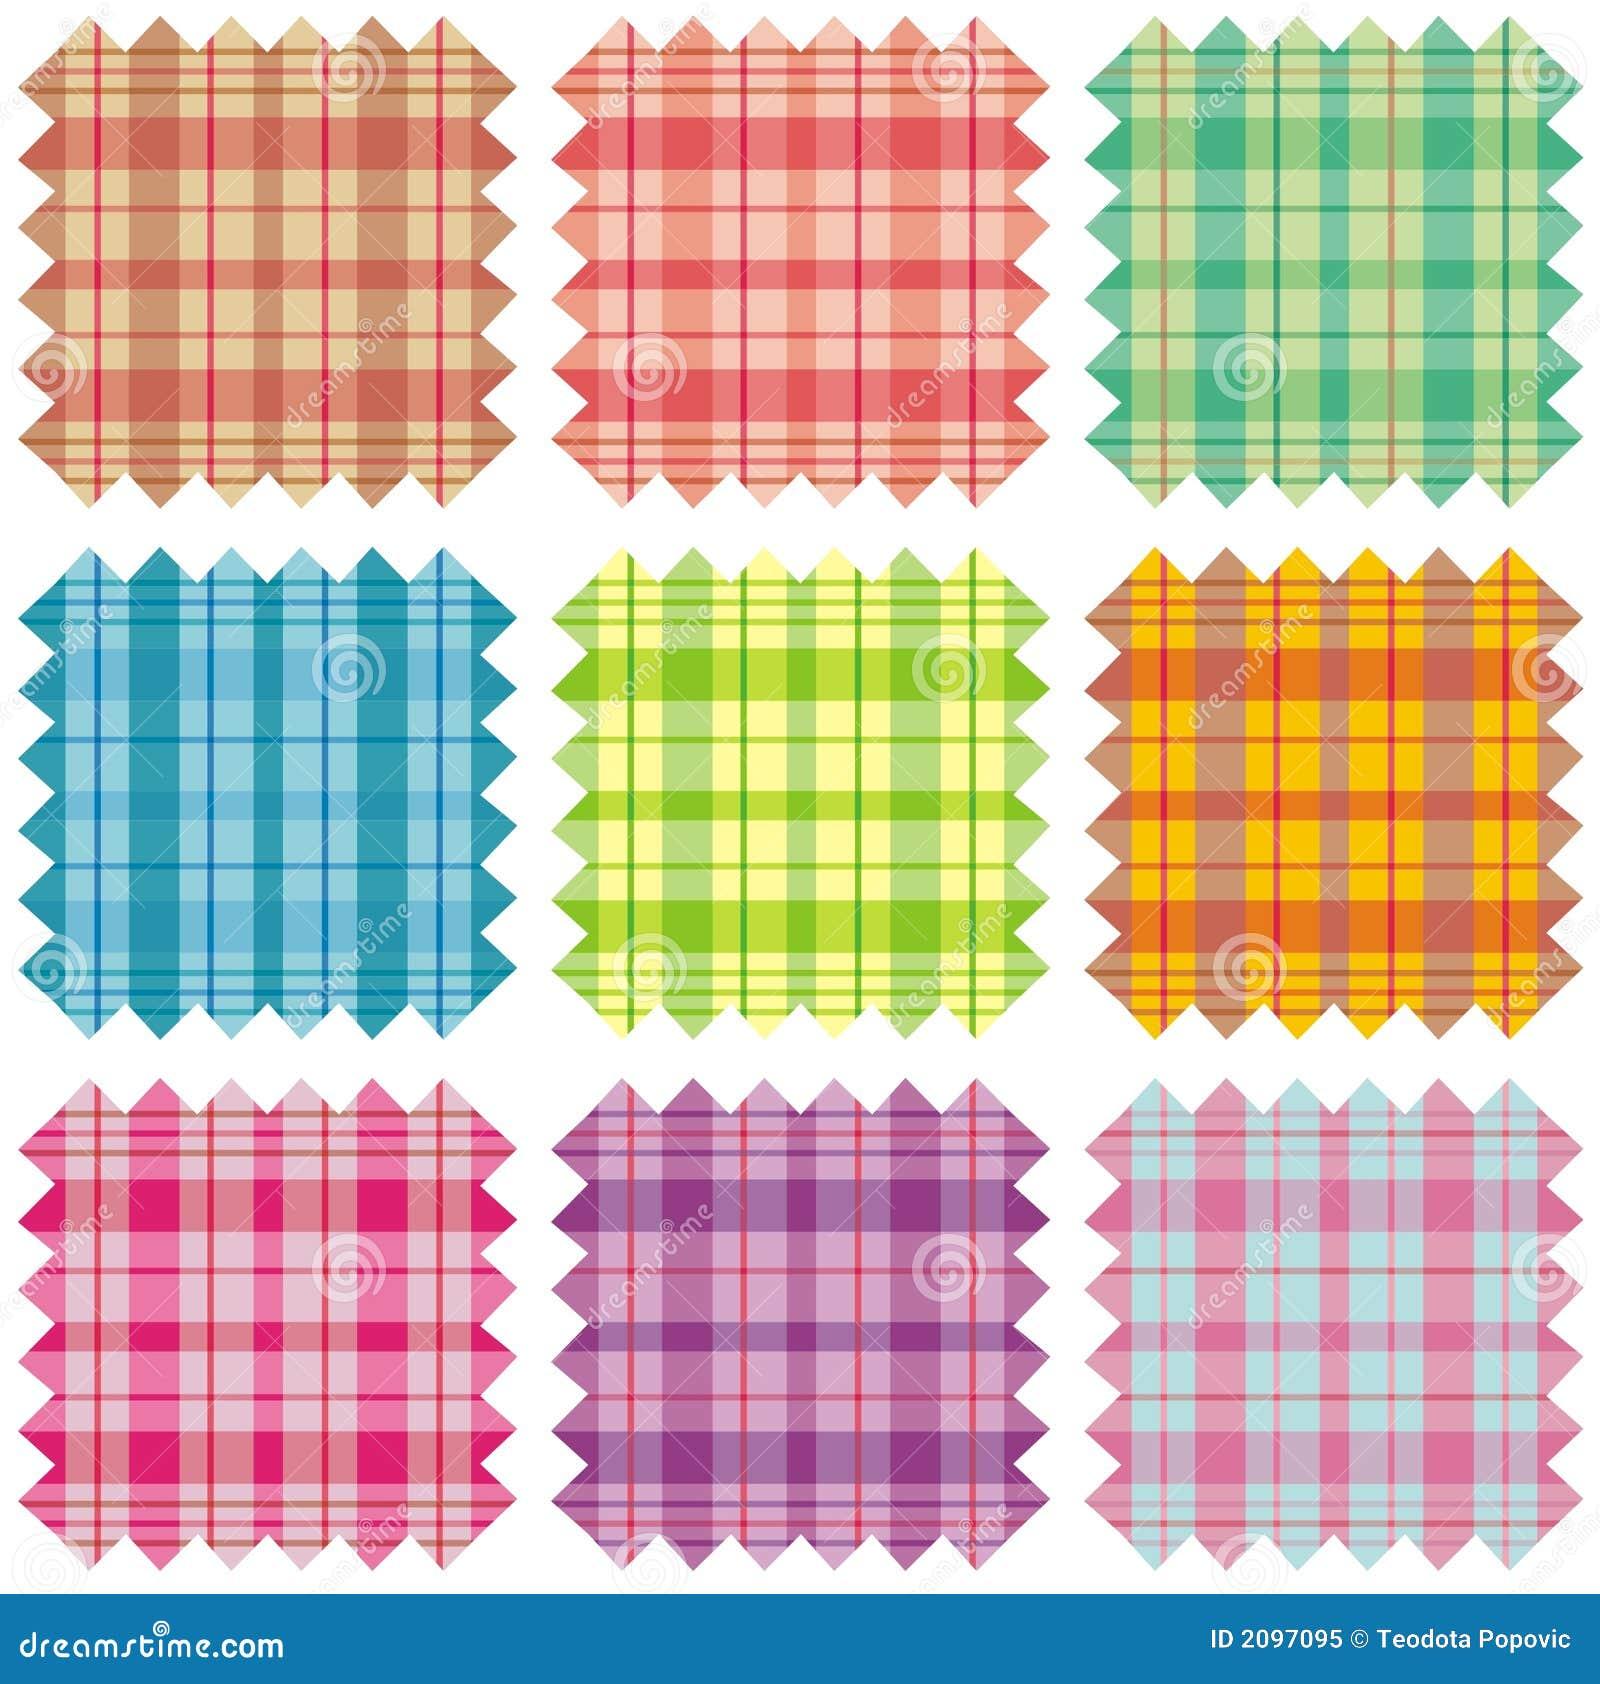 Fabric Samples Royalty Free Stock Photo - Image: 2097095